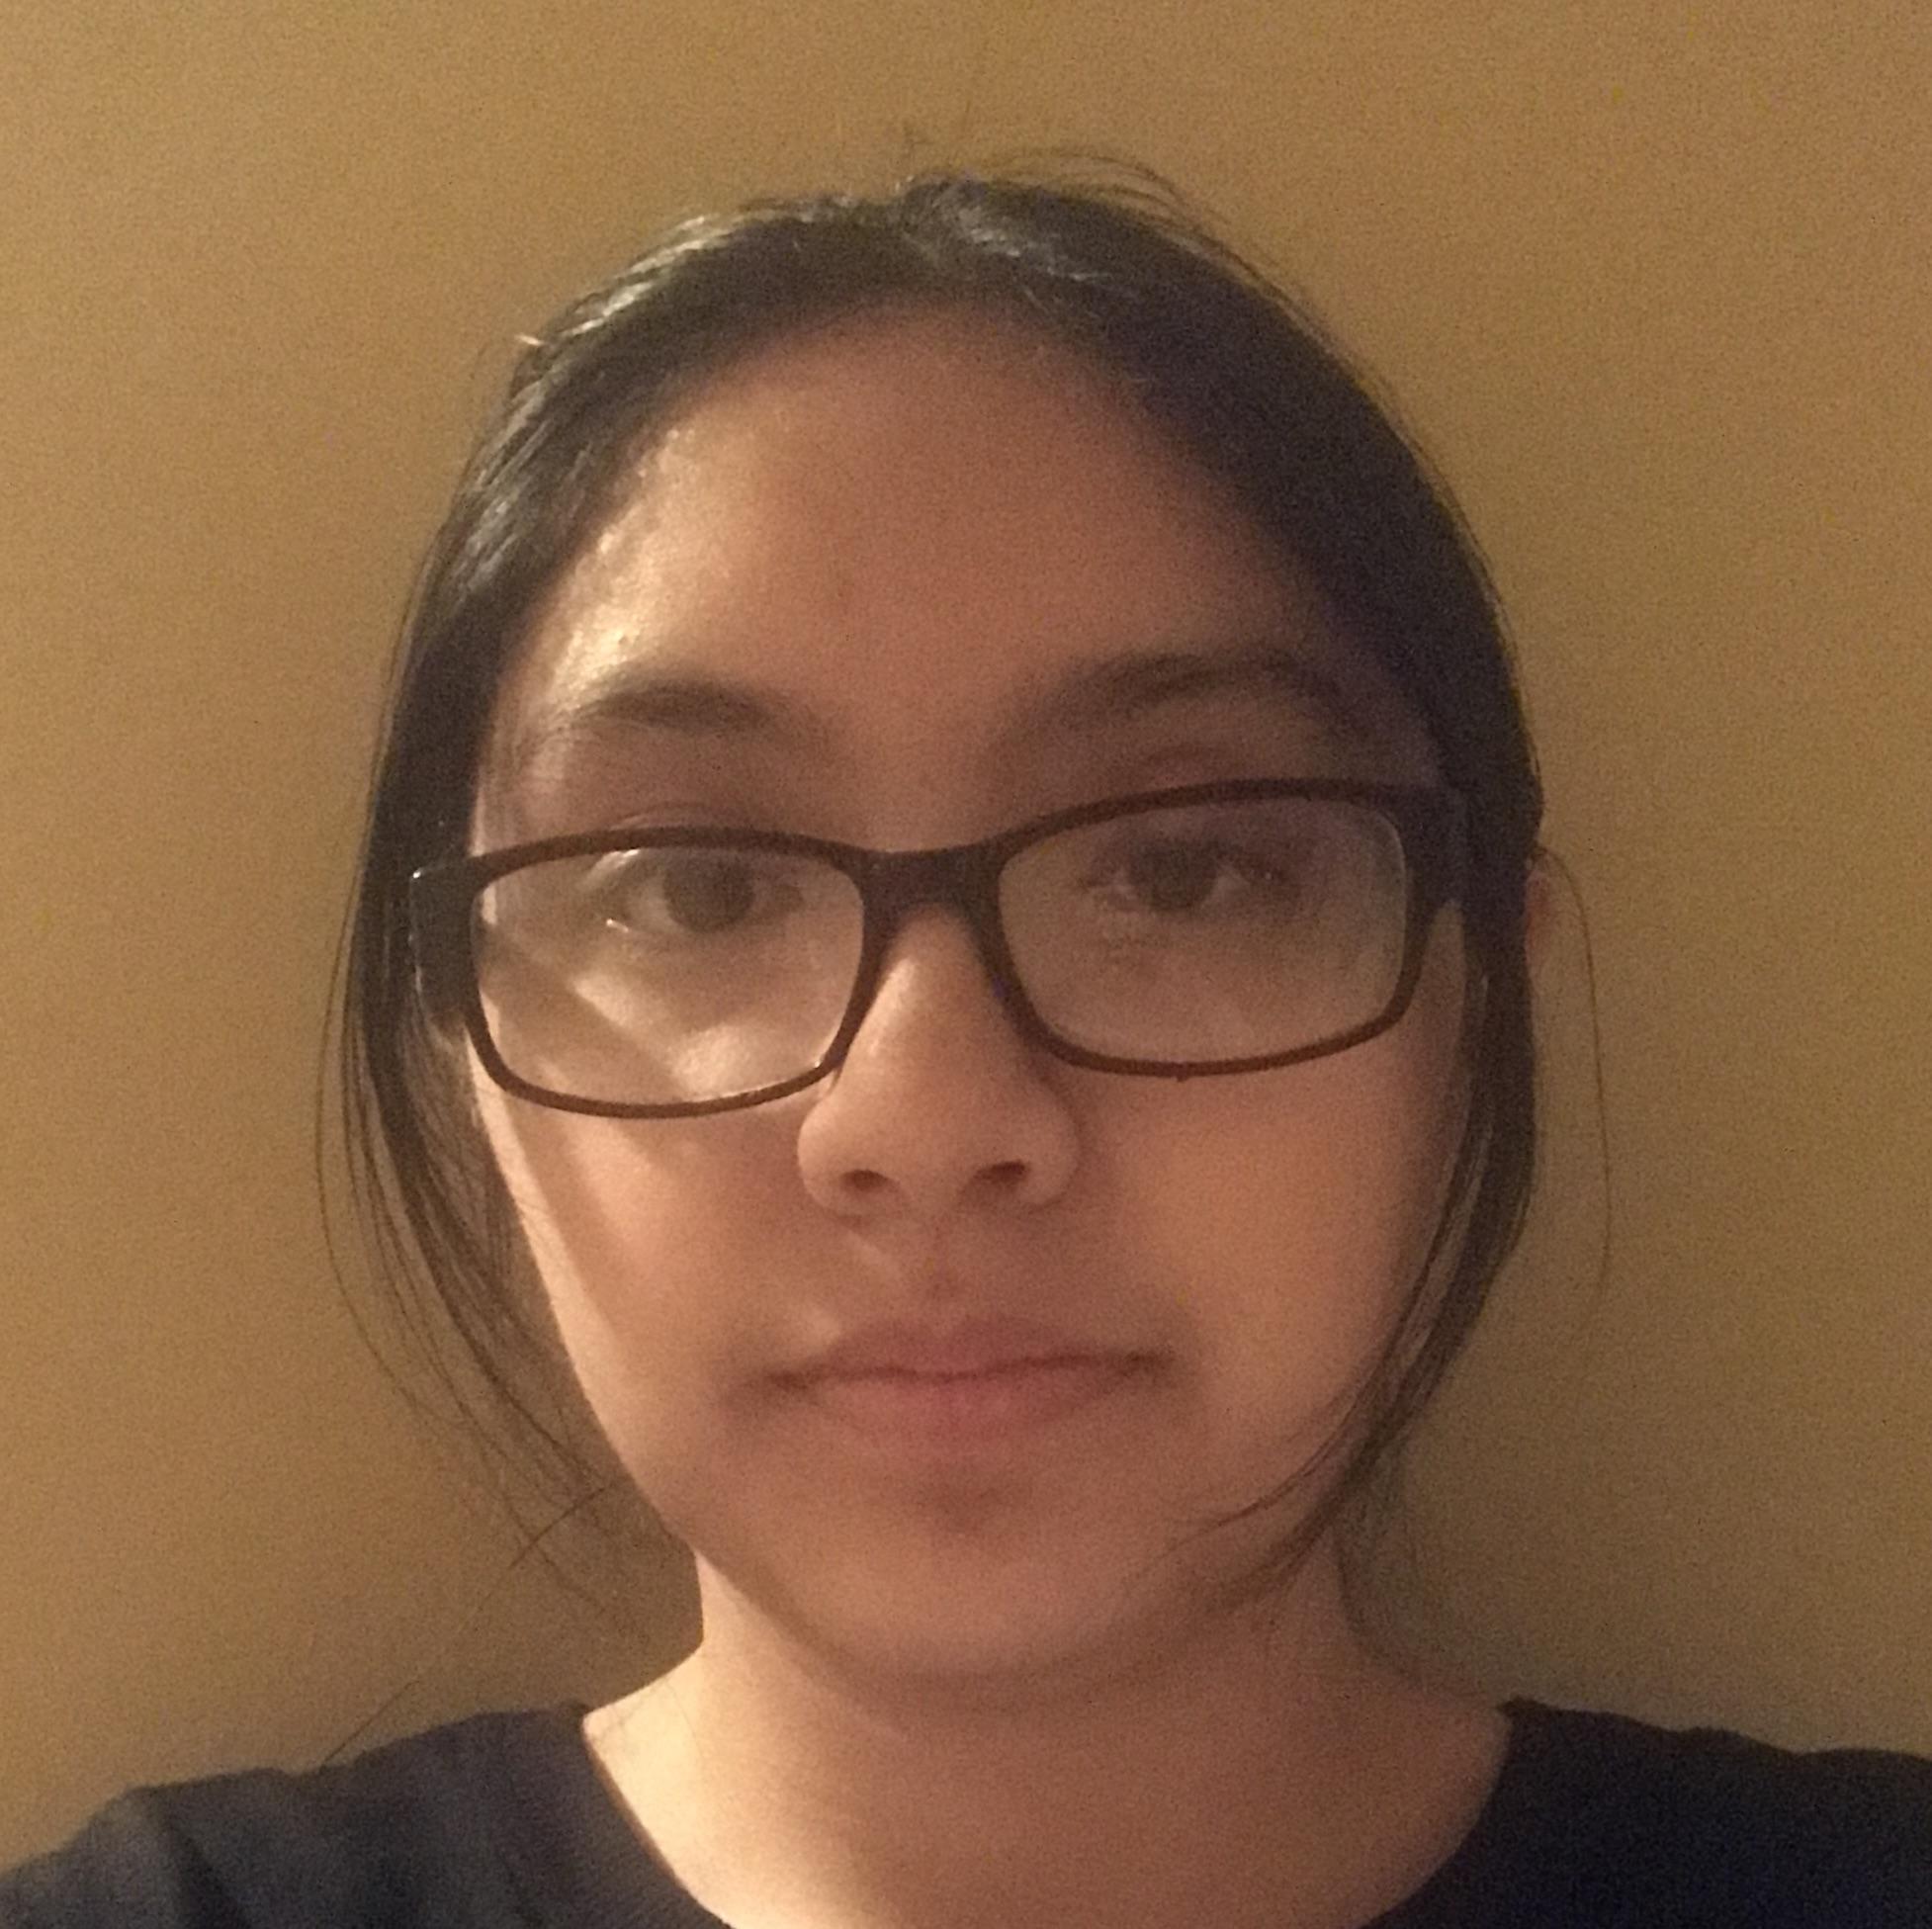 Student Deysi Sanisaca headshot